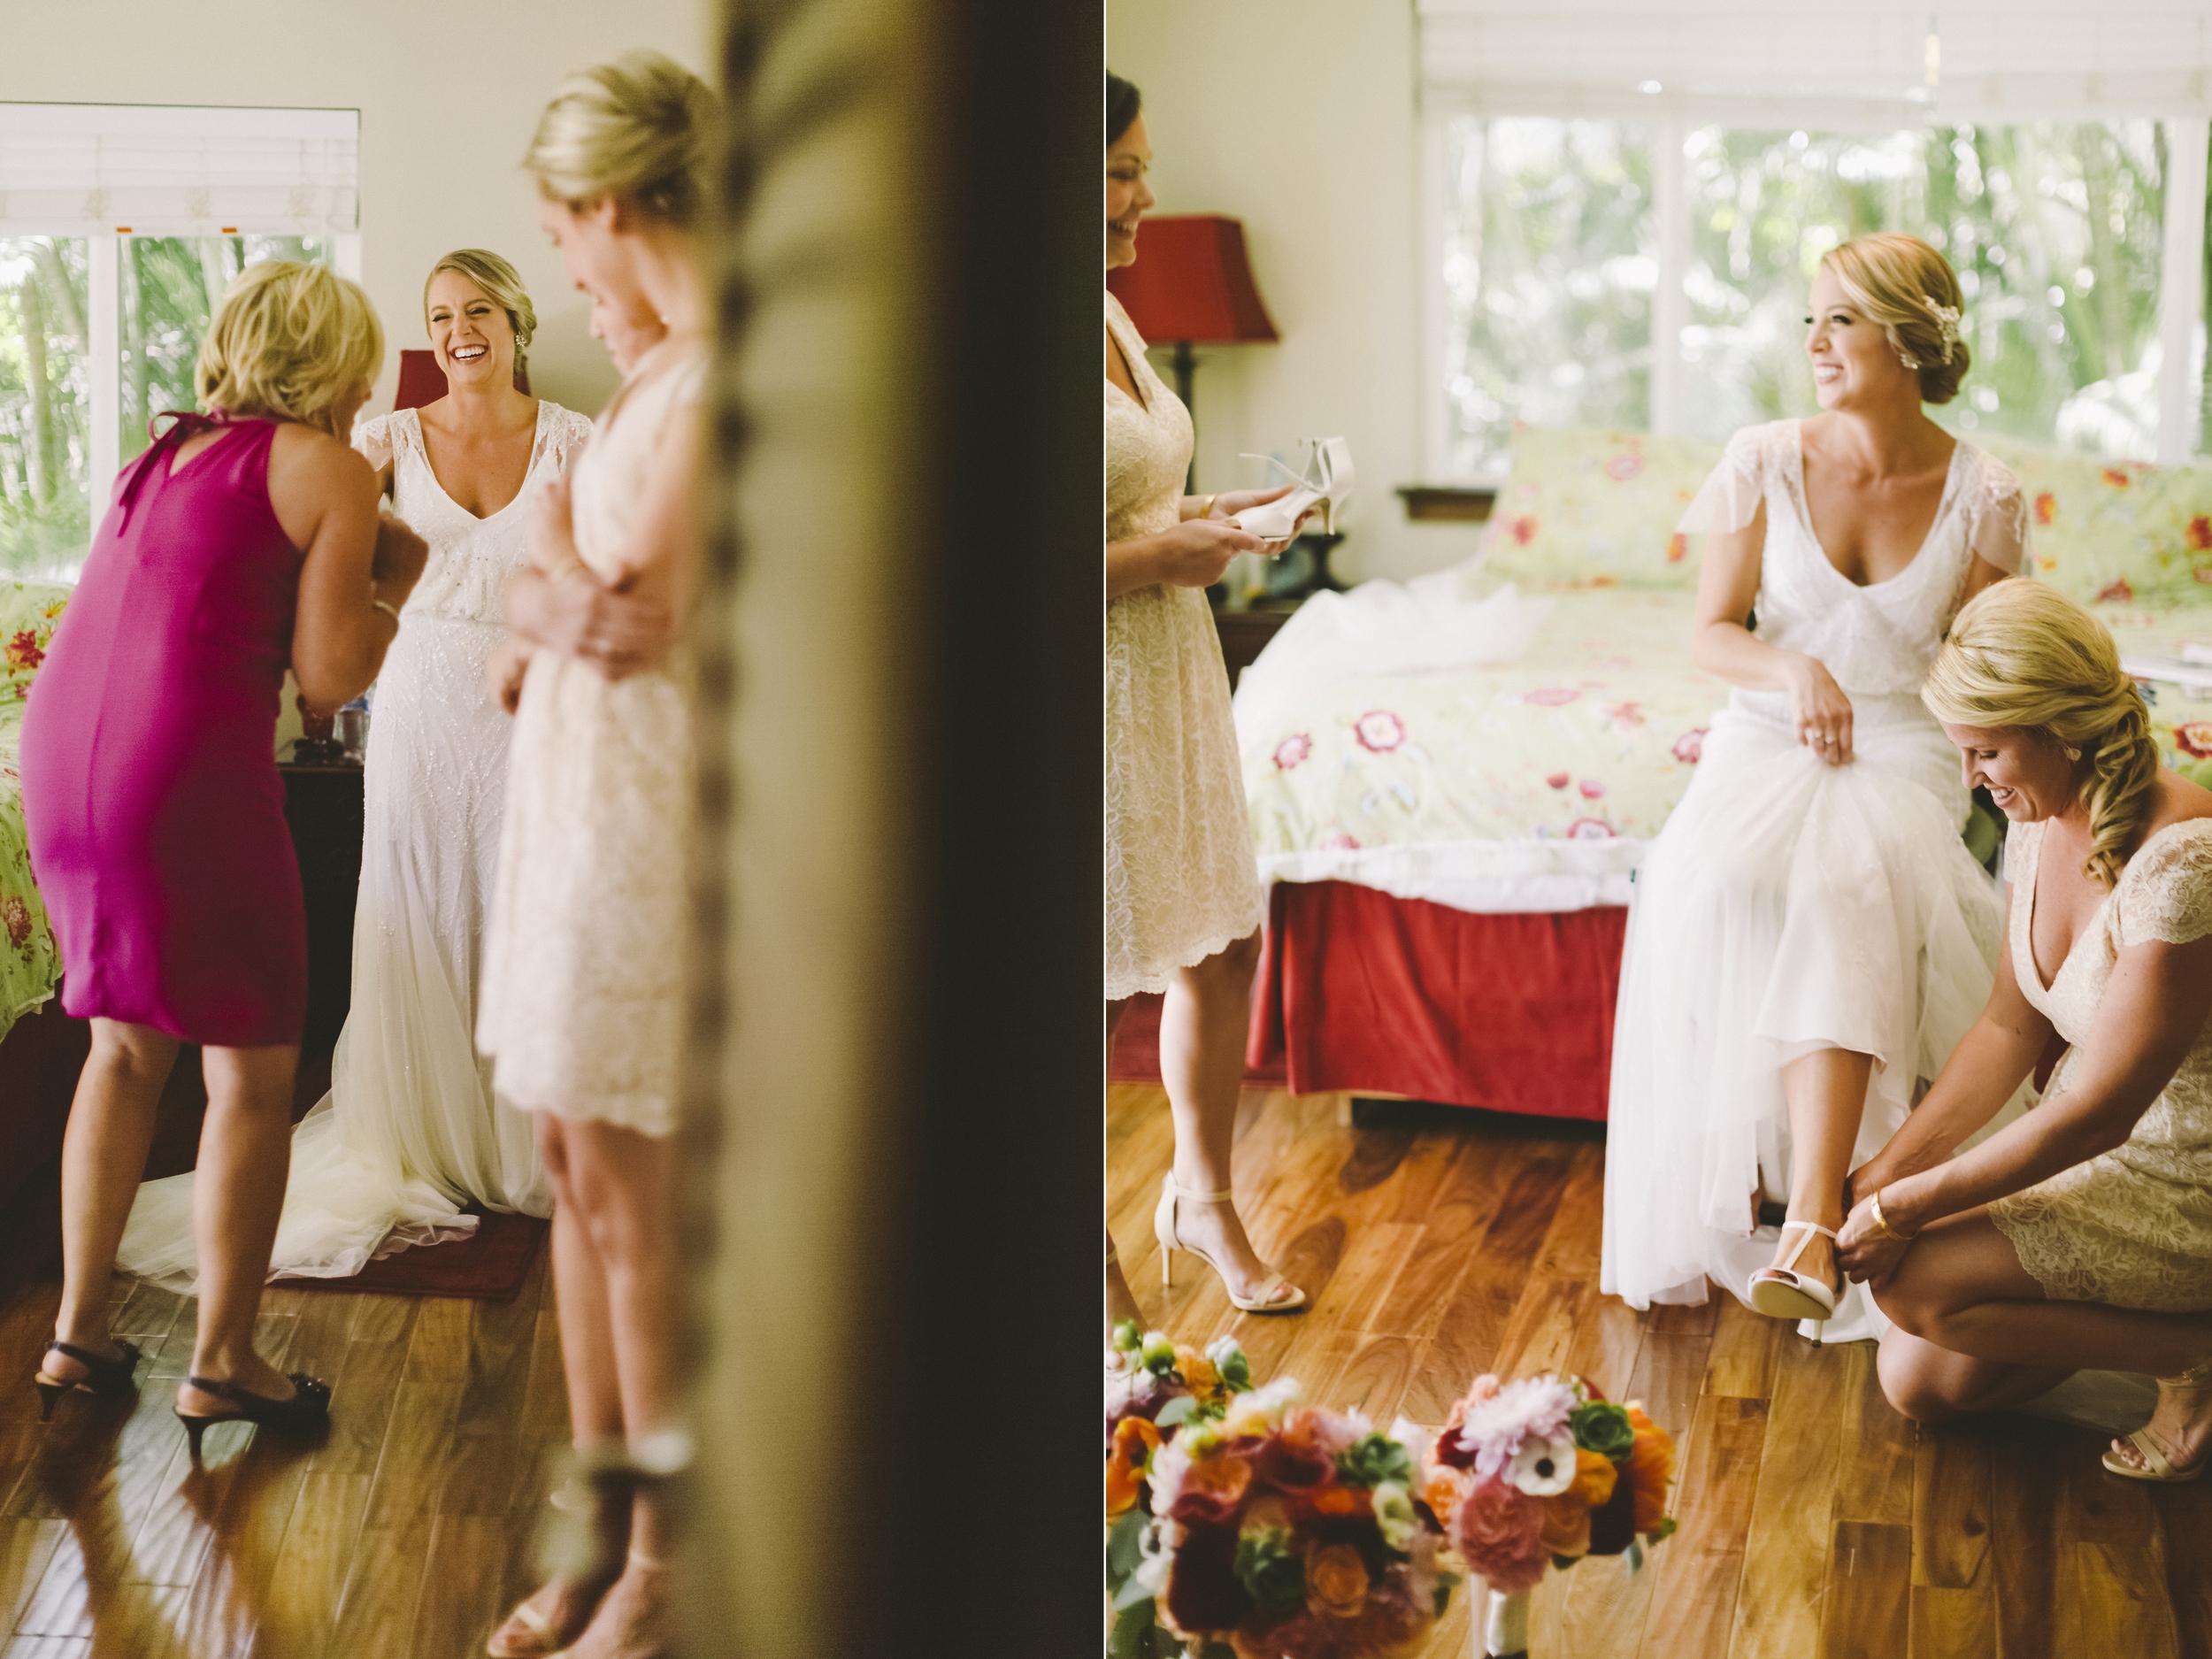 angie-diaz-photography-maui-wedding-mel-matt-11.jpg